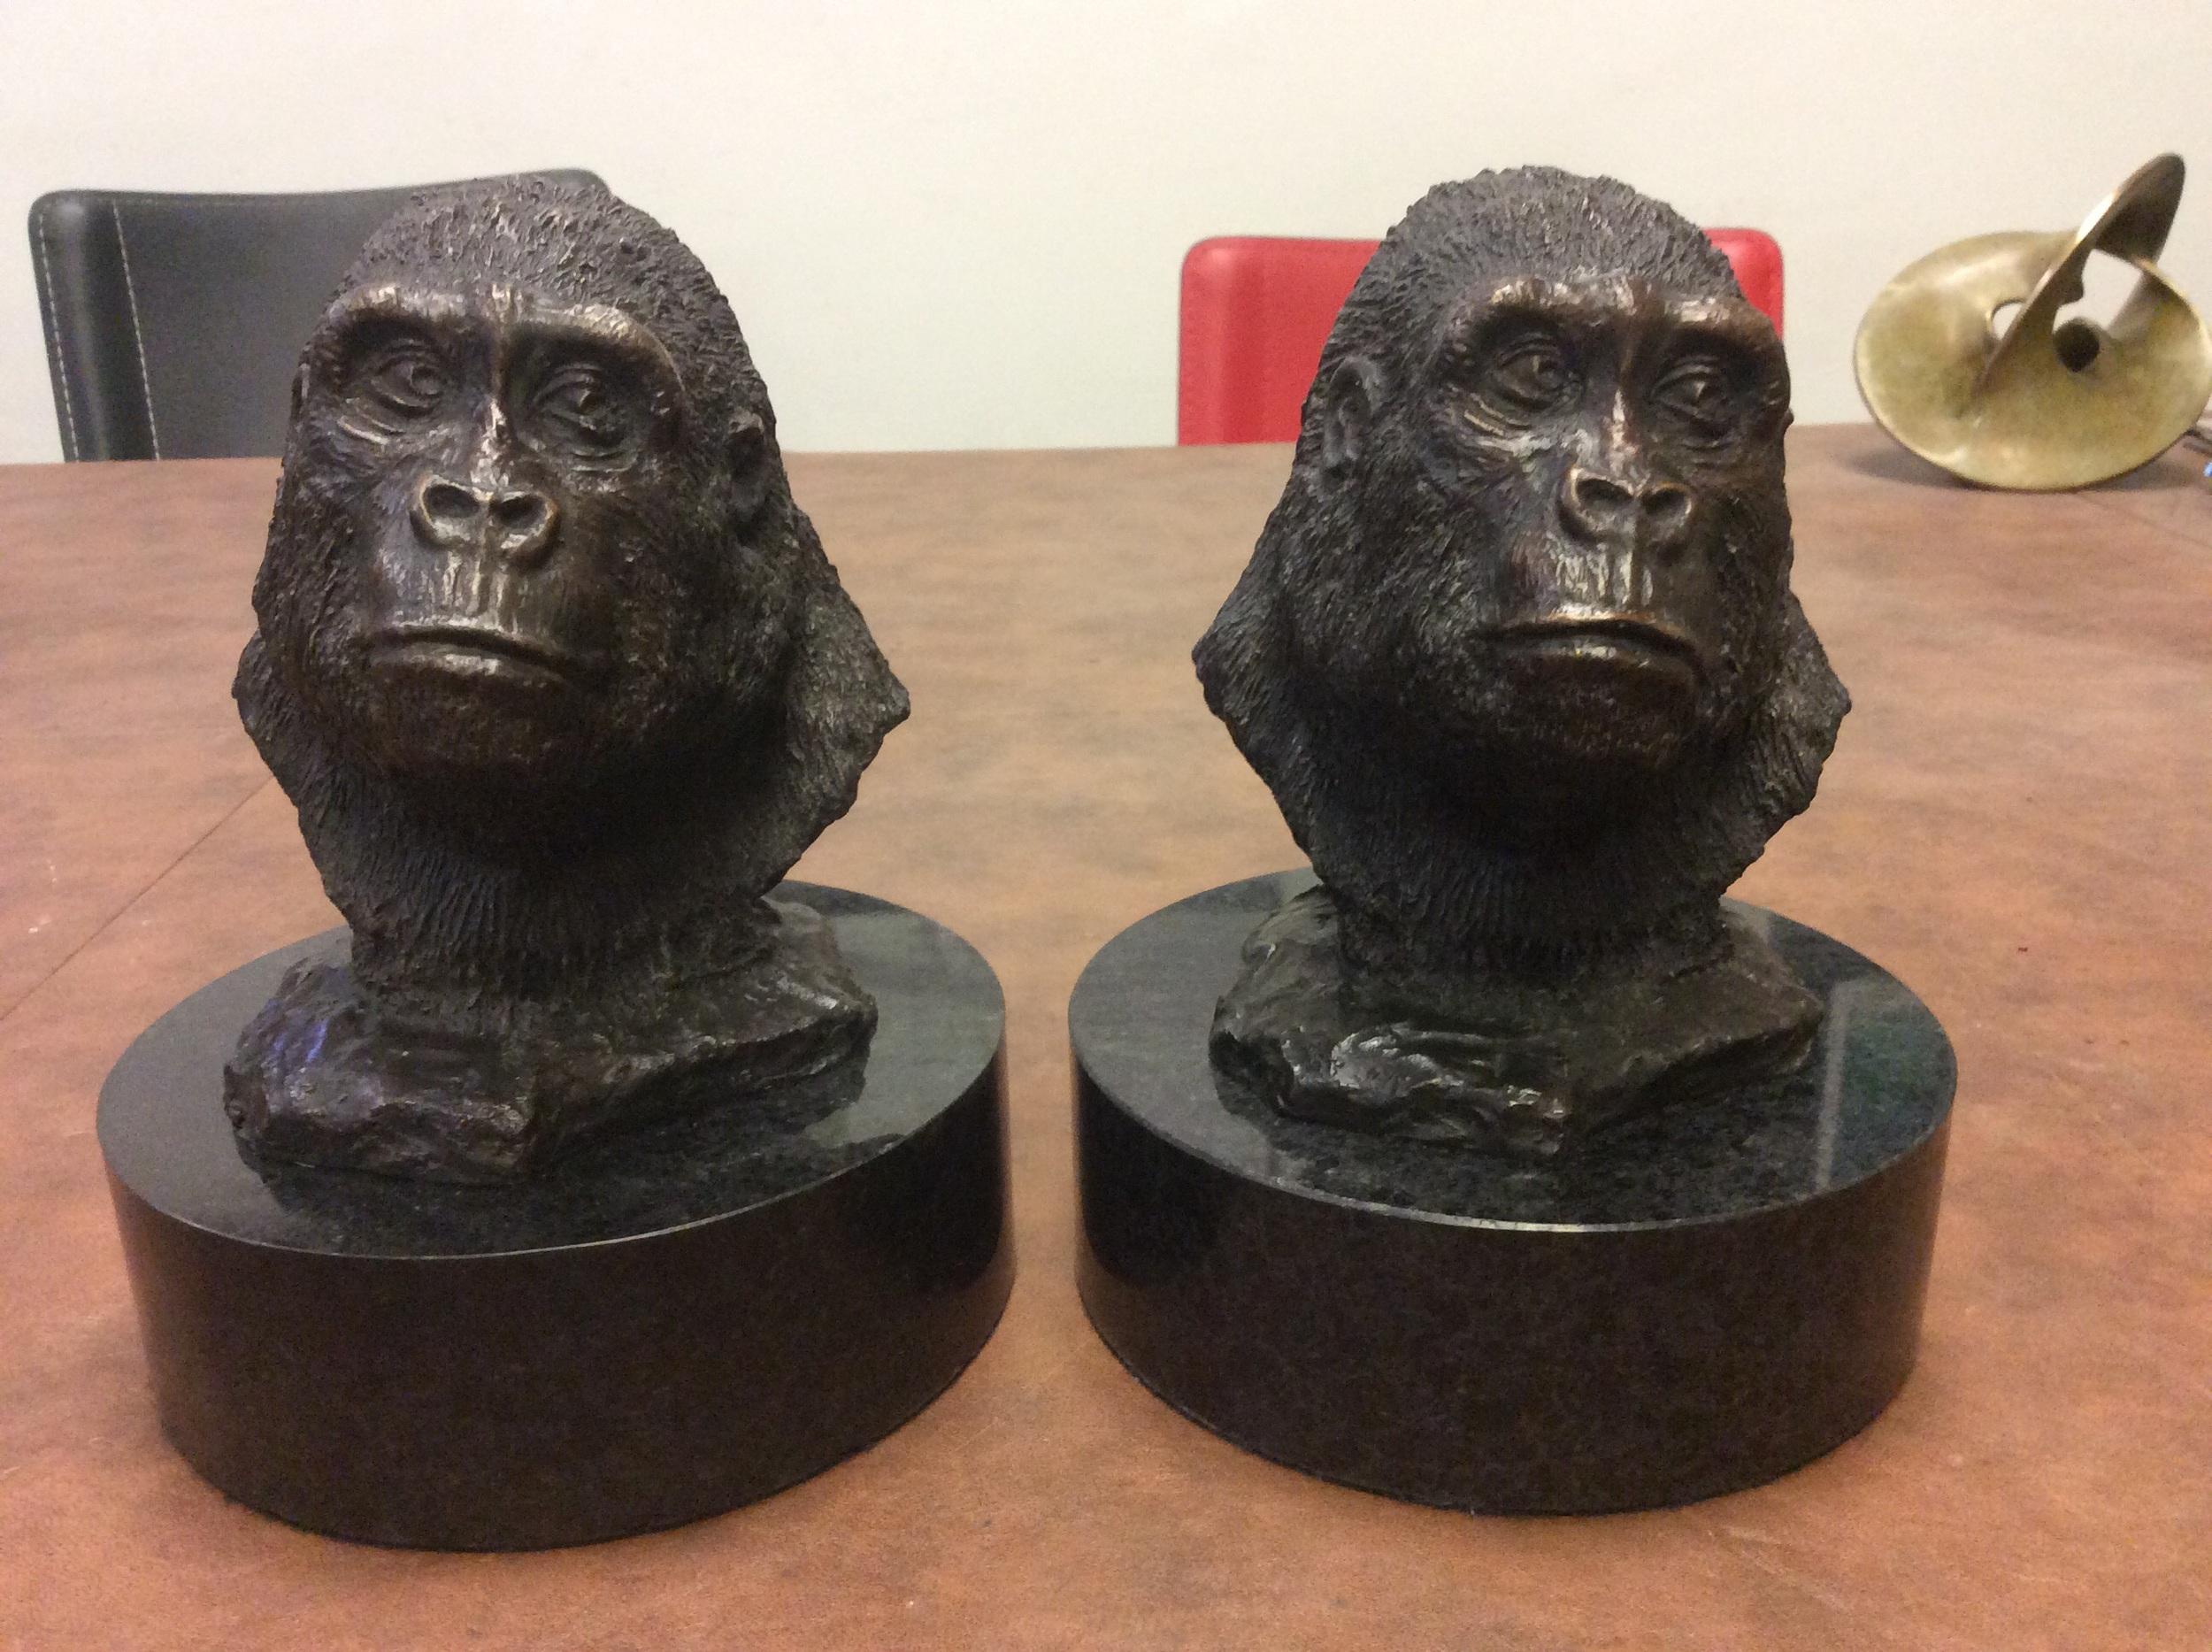 Gorilla portraits by Michael E. Wierski